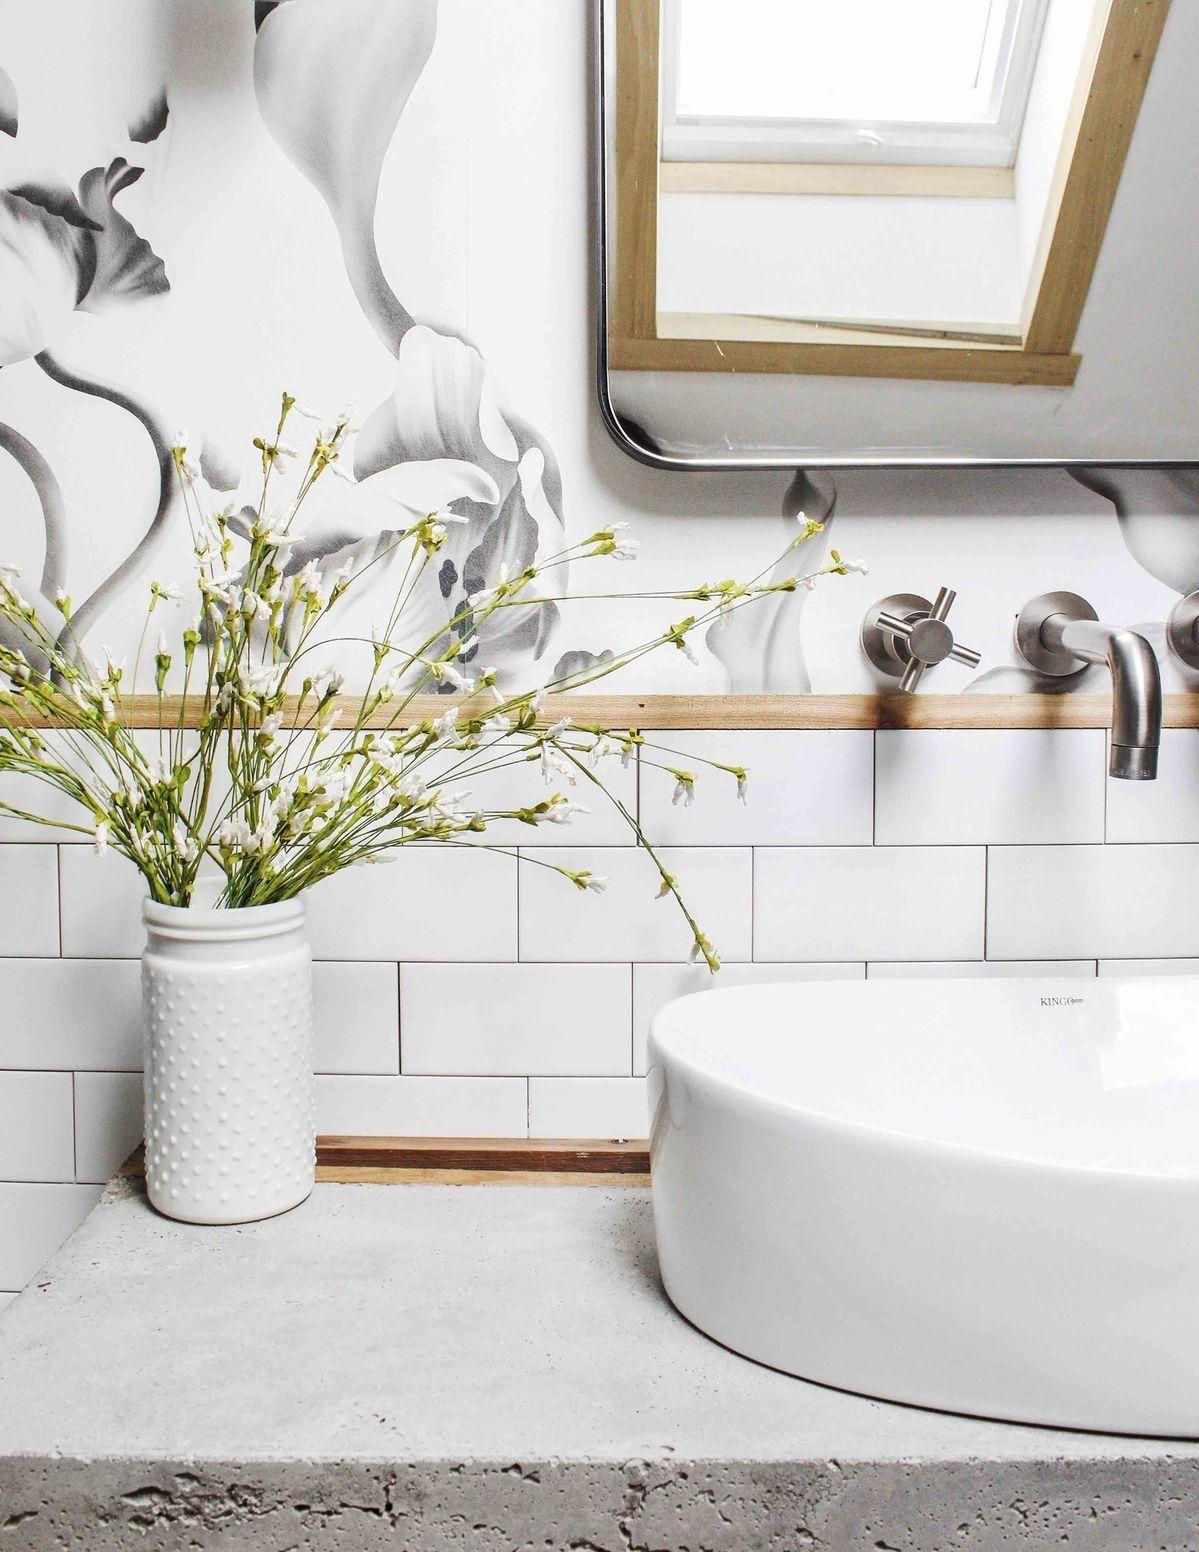 Carta da parati in bagno 5 motivi per installarla (senza